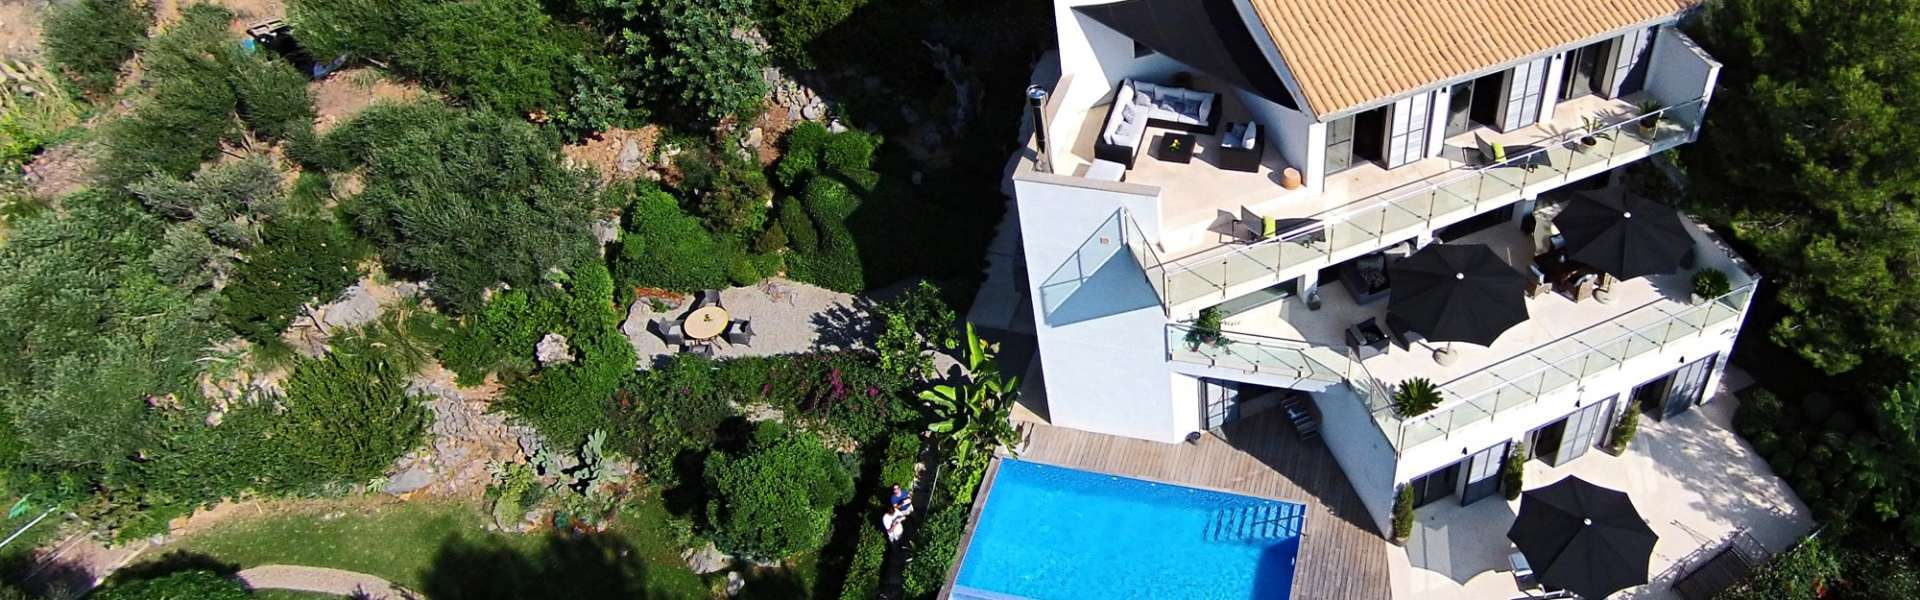 Port de Soller - Moderne Villa mit Traumblick